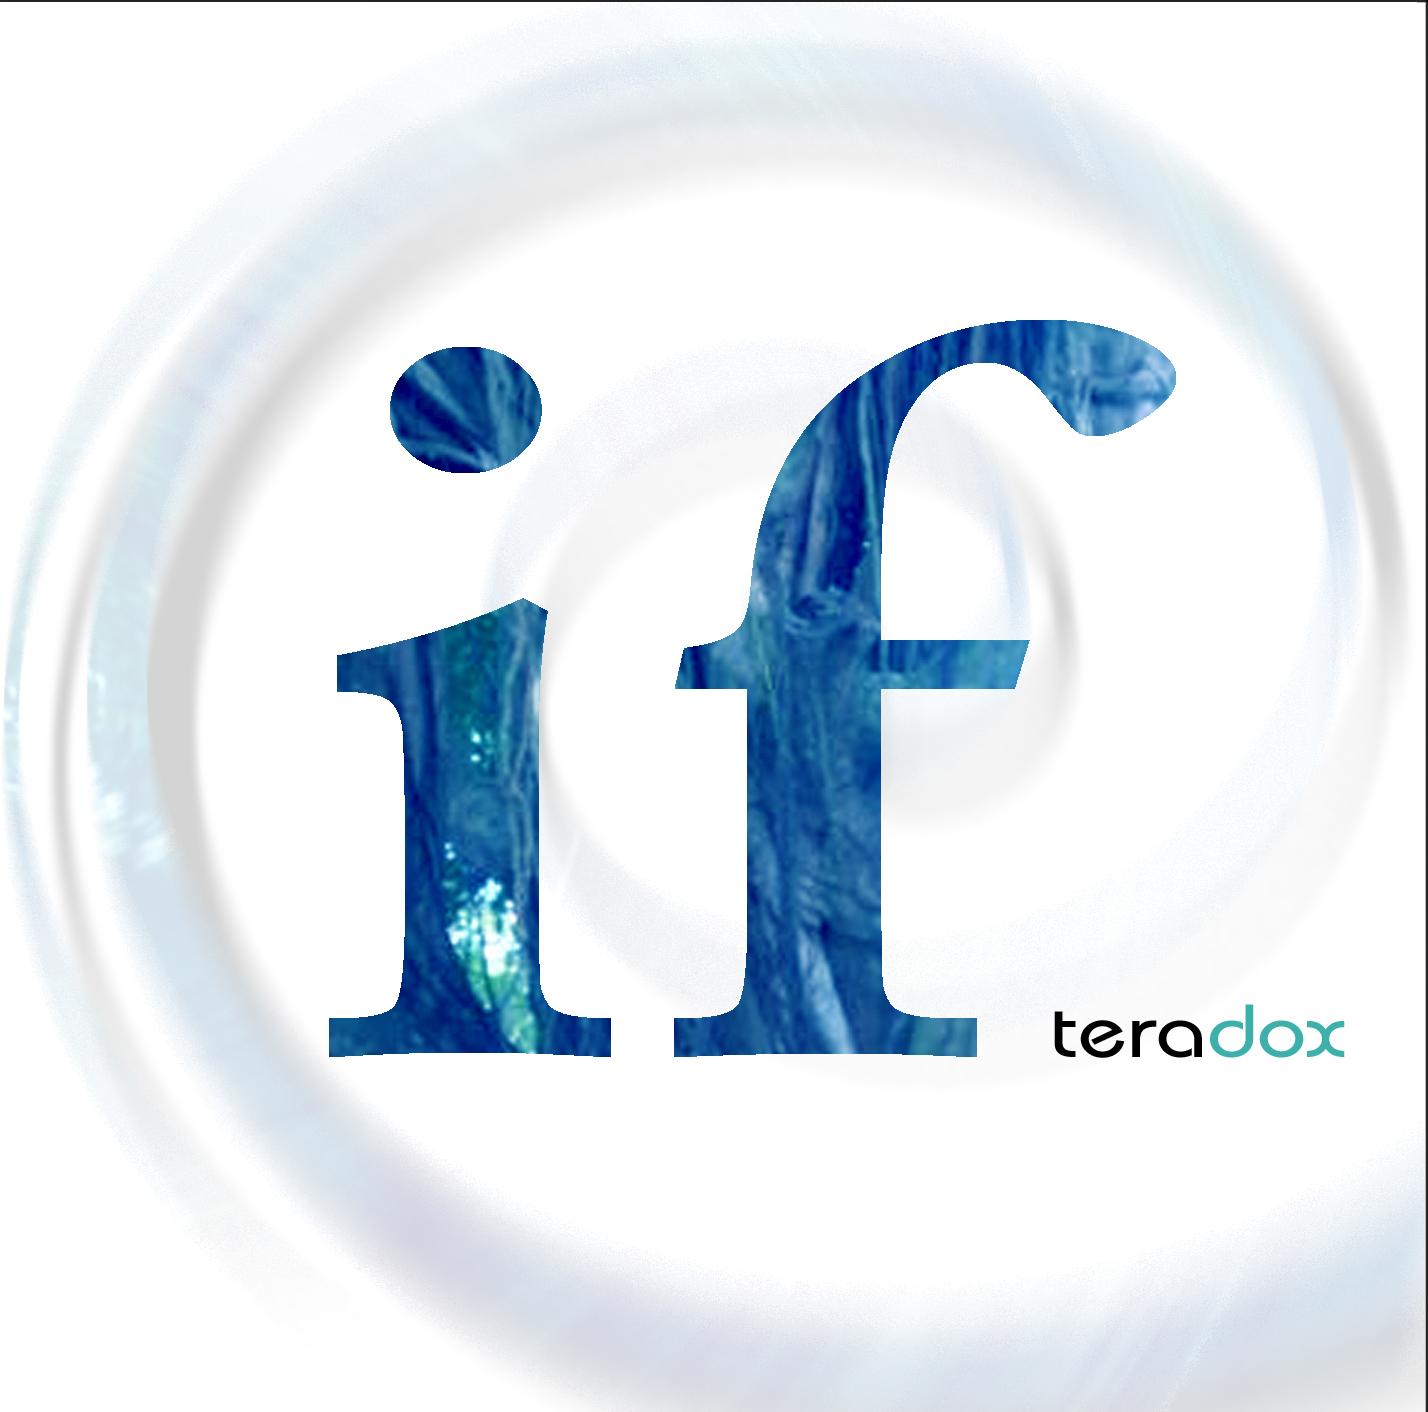 Teradox - IF